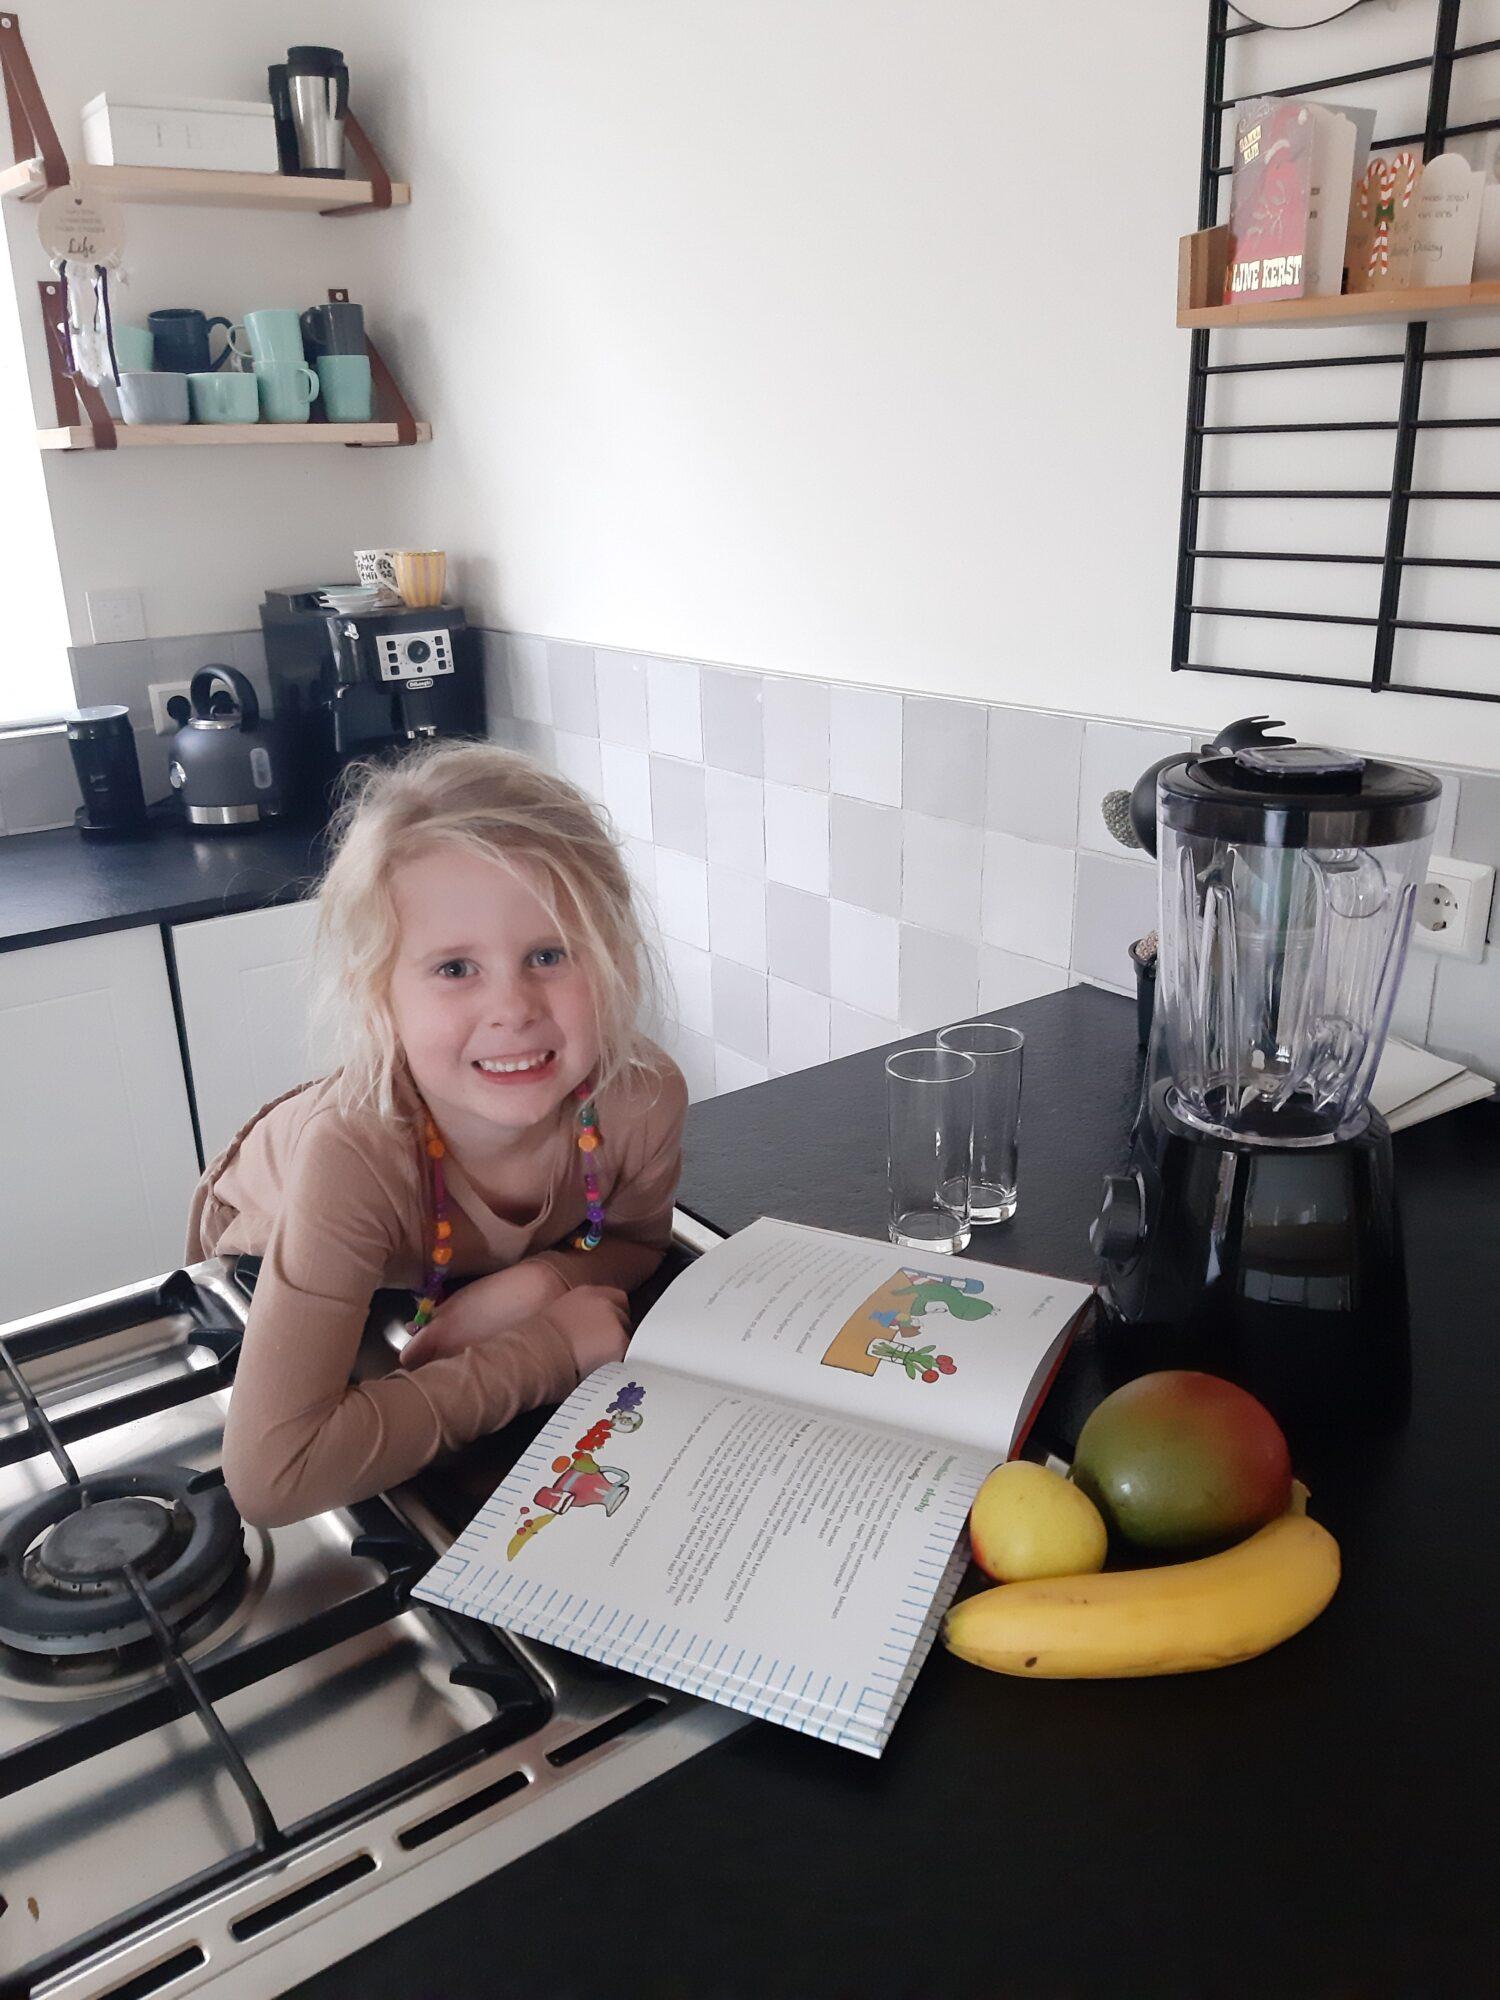 Wonderbaar Koken met kikker • Juf Maike SB-91